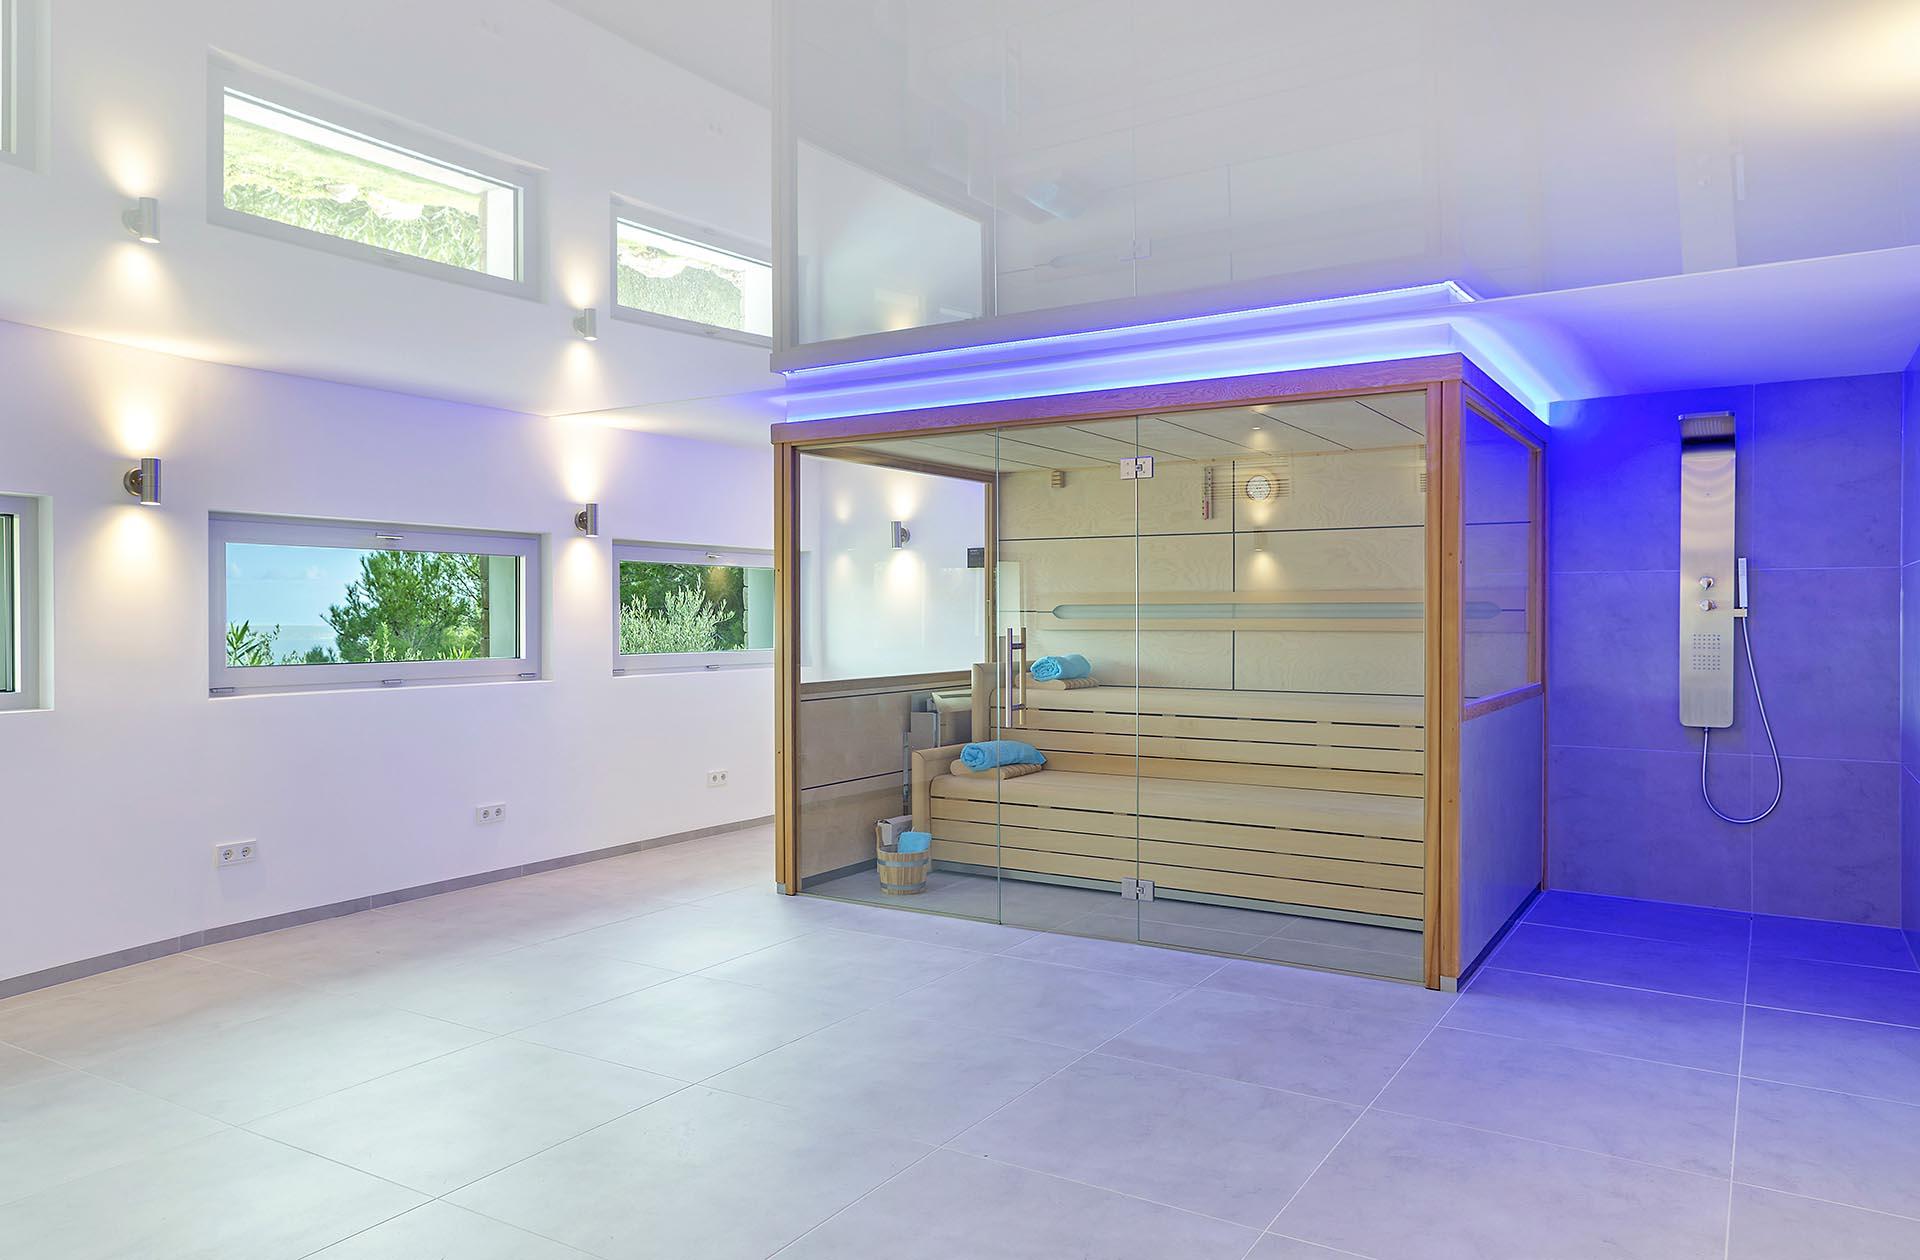 Beautiful modern villa in Costa den Blanes - Luxurious sauna area